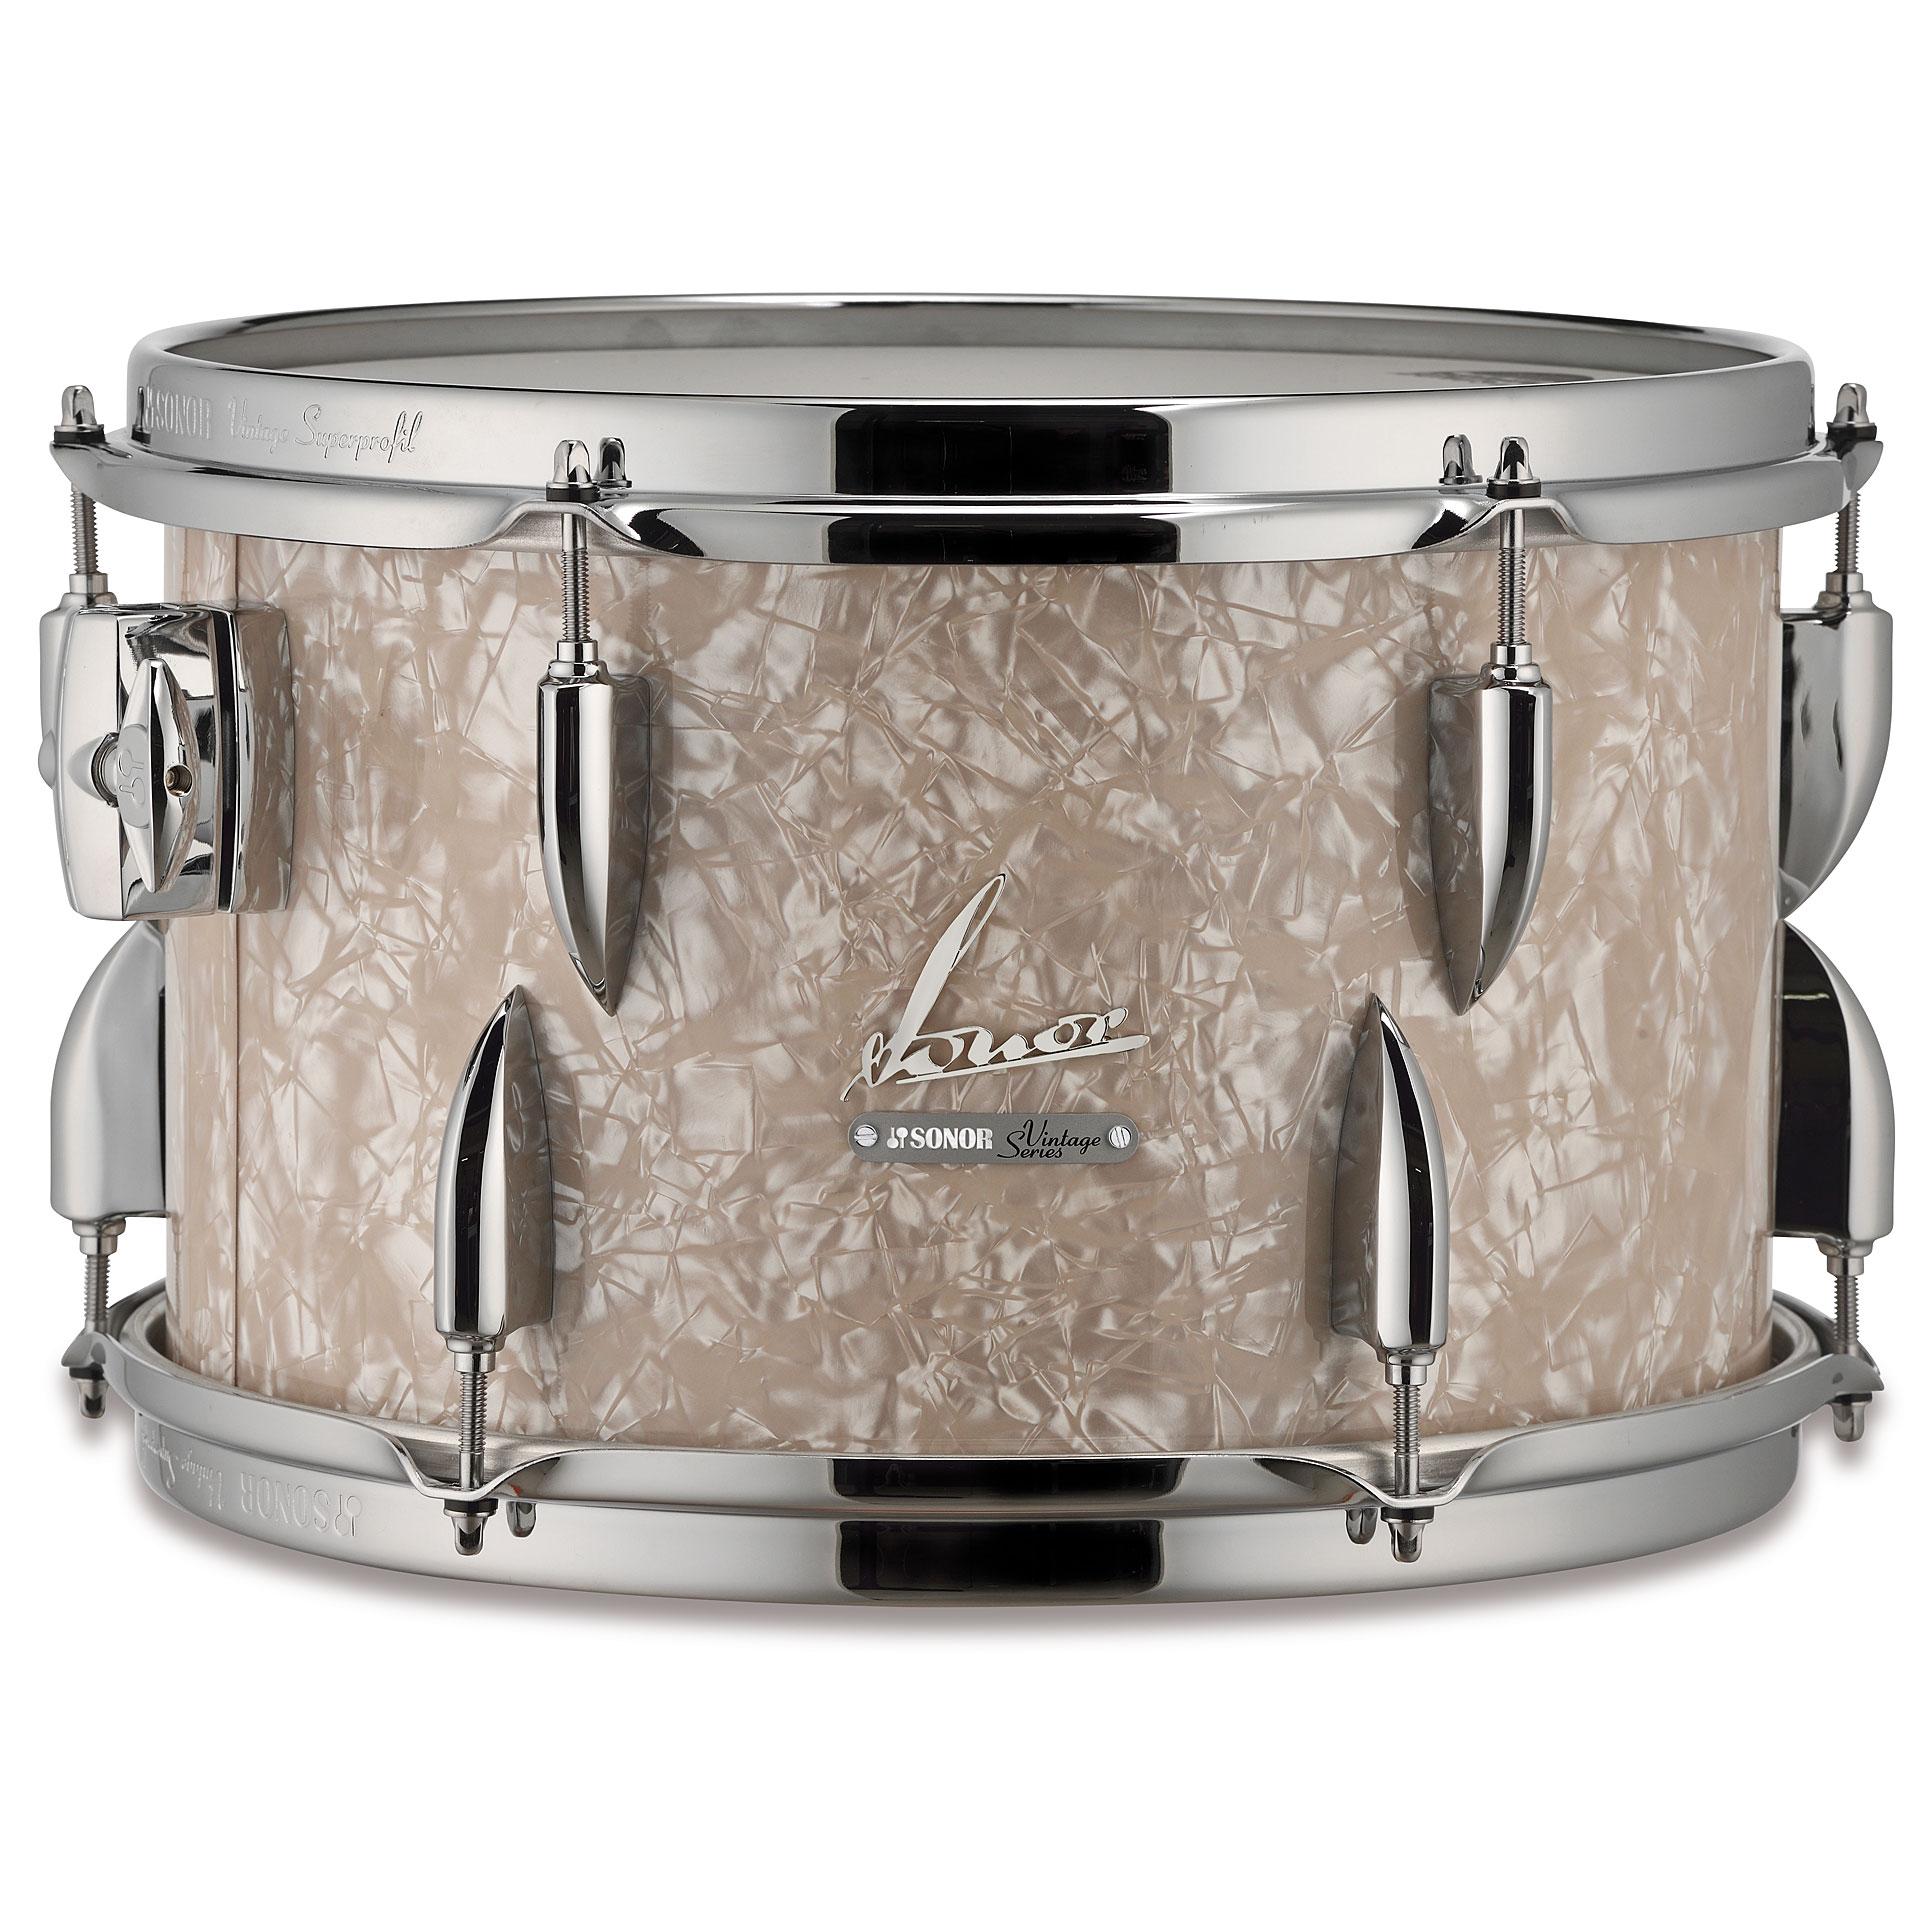 Drum Kit Sonor Vintage Series Vt15 Three22 Vintage Pearl (2)